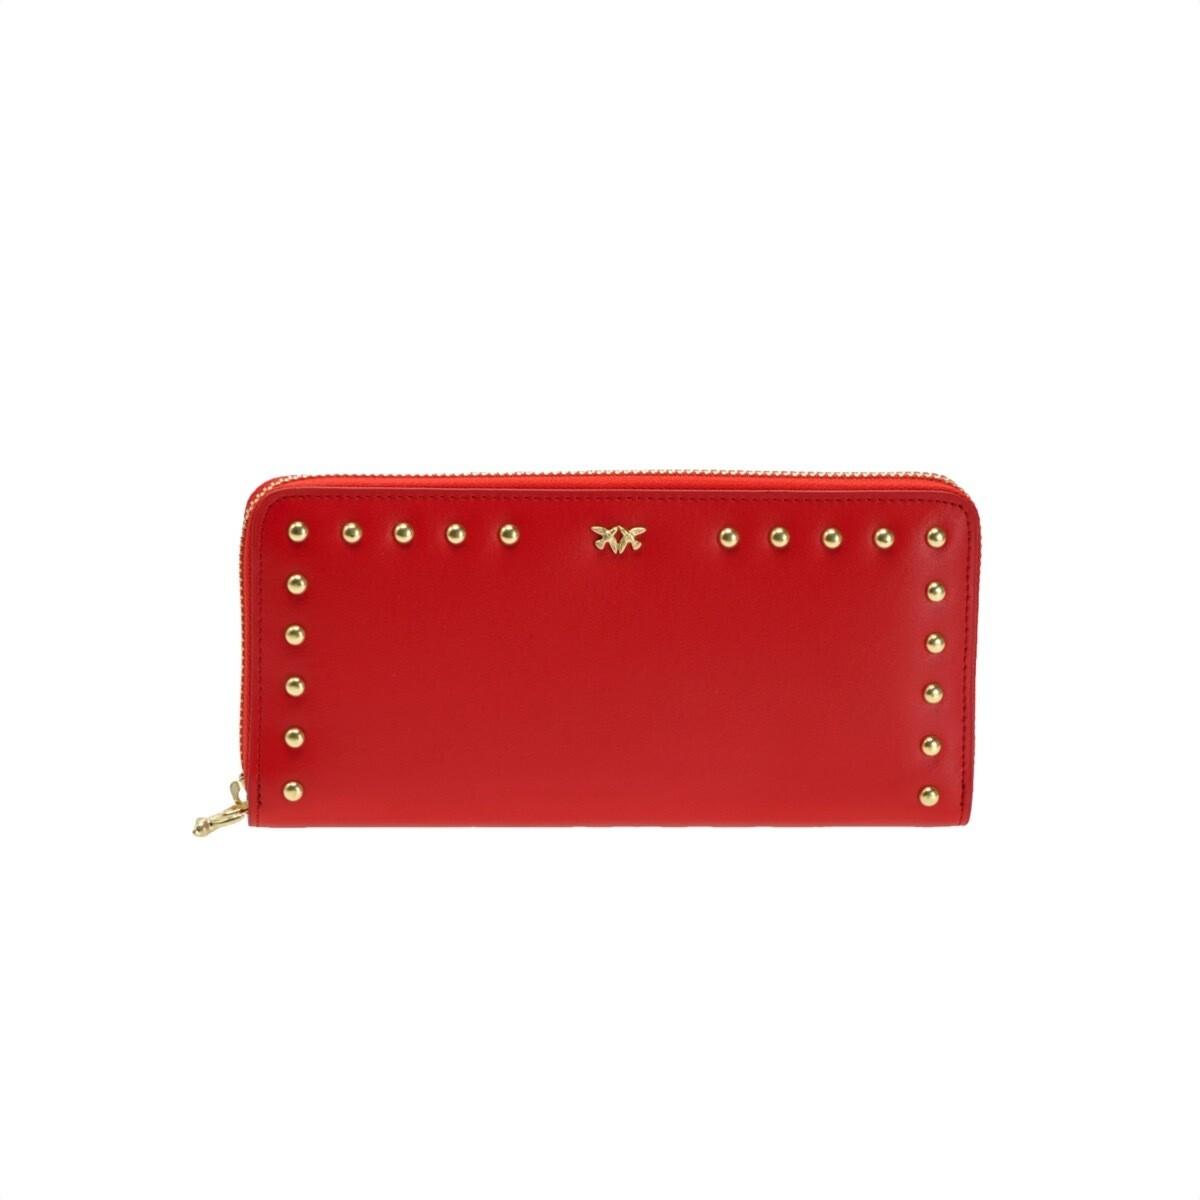 PINKO - Blonde Portafoglio Zip Around in pelle con borchie - Red